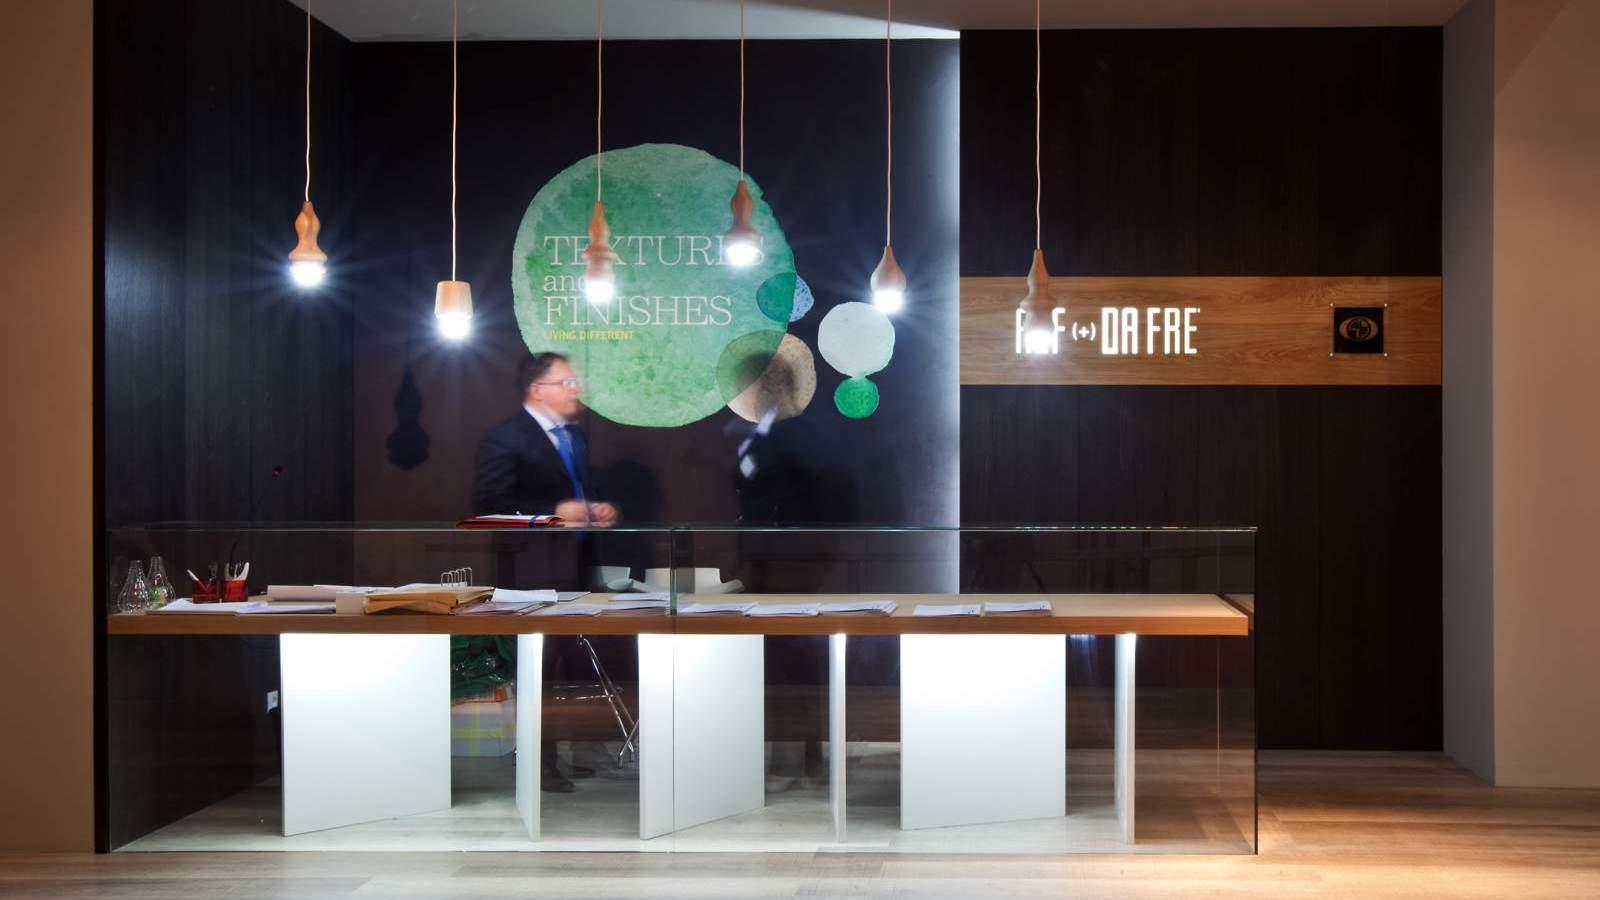 Alf da fr salone del mobile 2012 milano bottega for I saloni del mobile milano